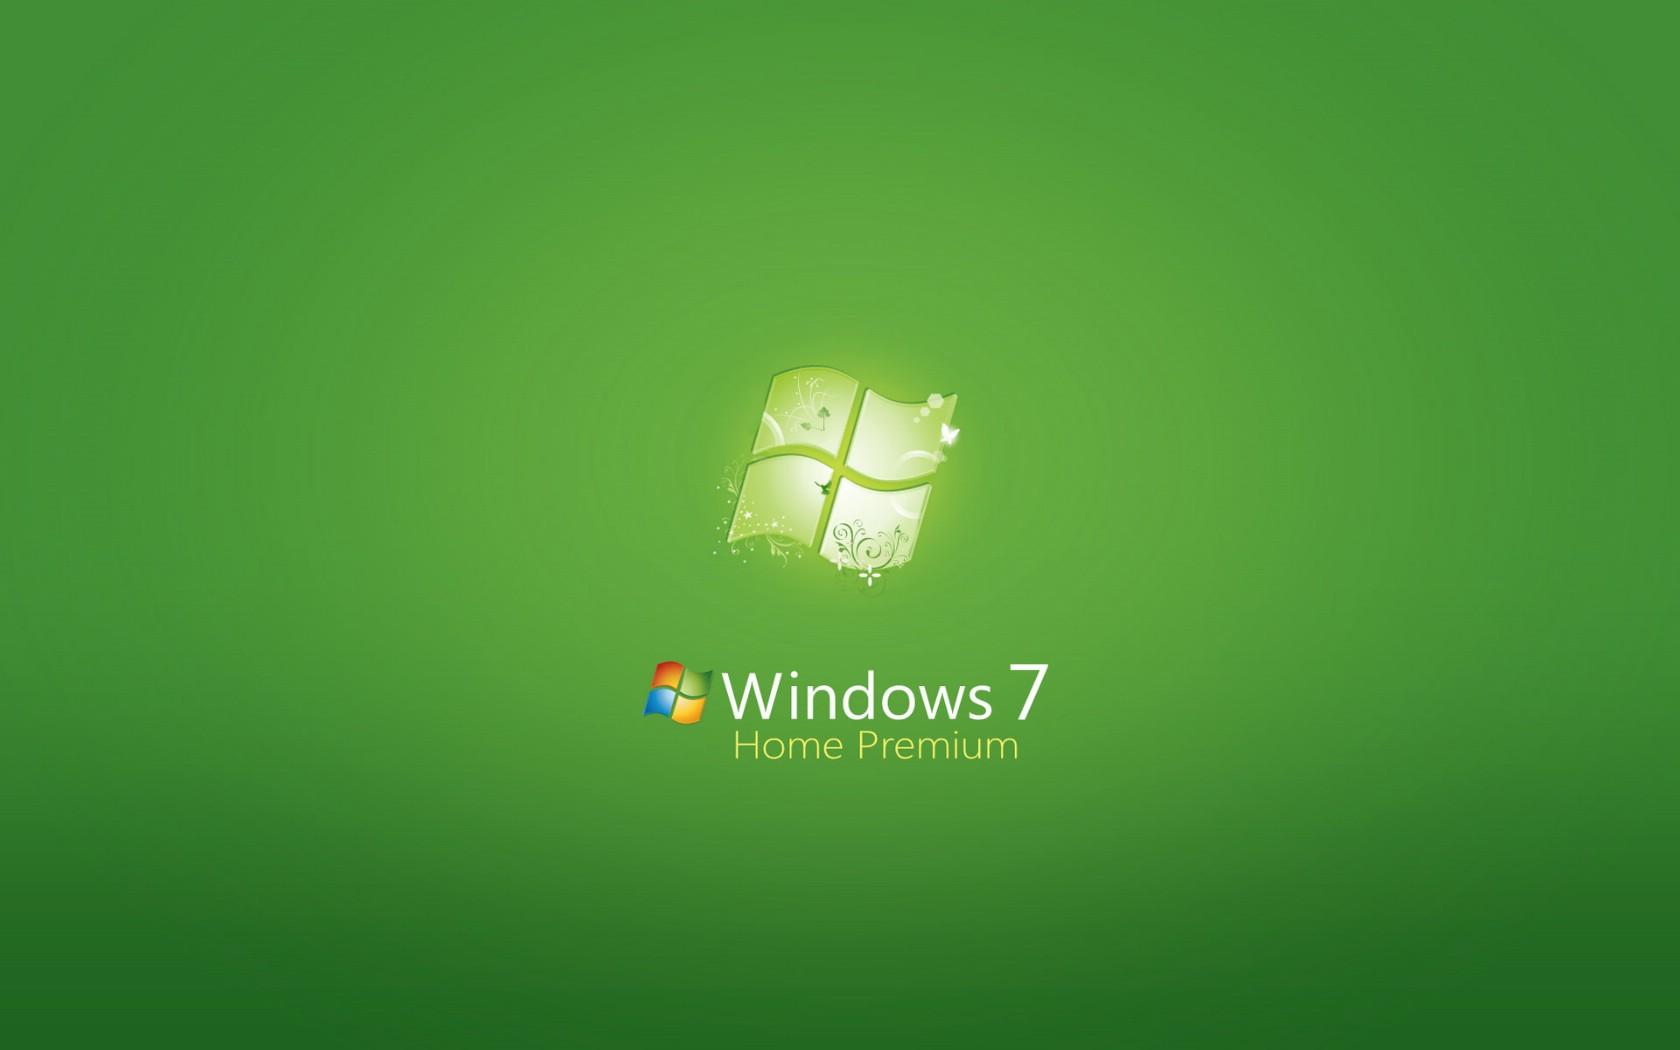 壁纸1680 1050Windows7 5 9壁纸,Windows7壁纸图片图片